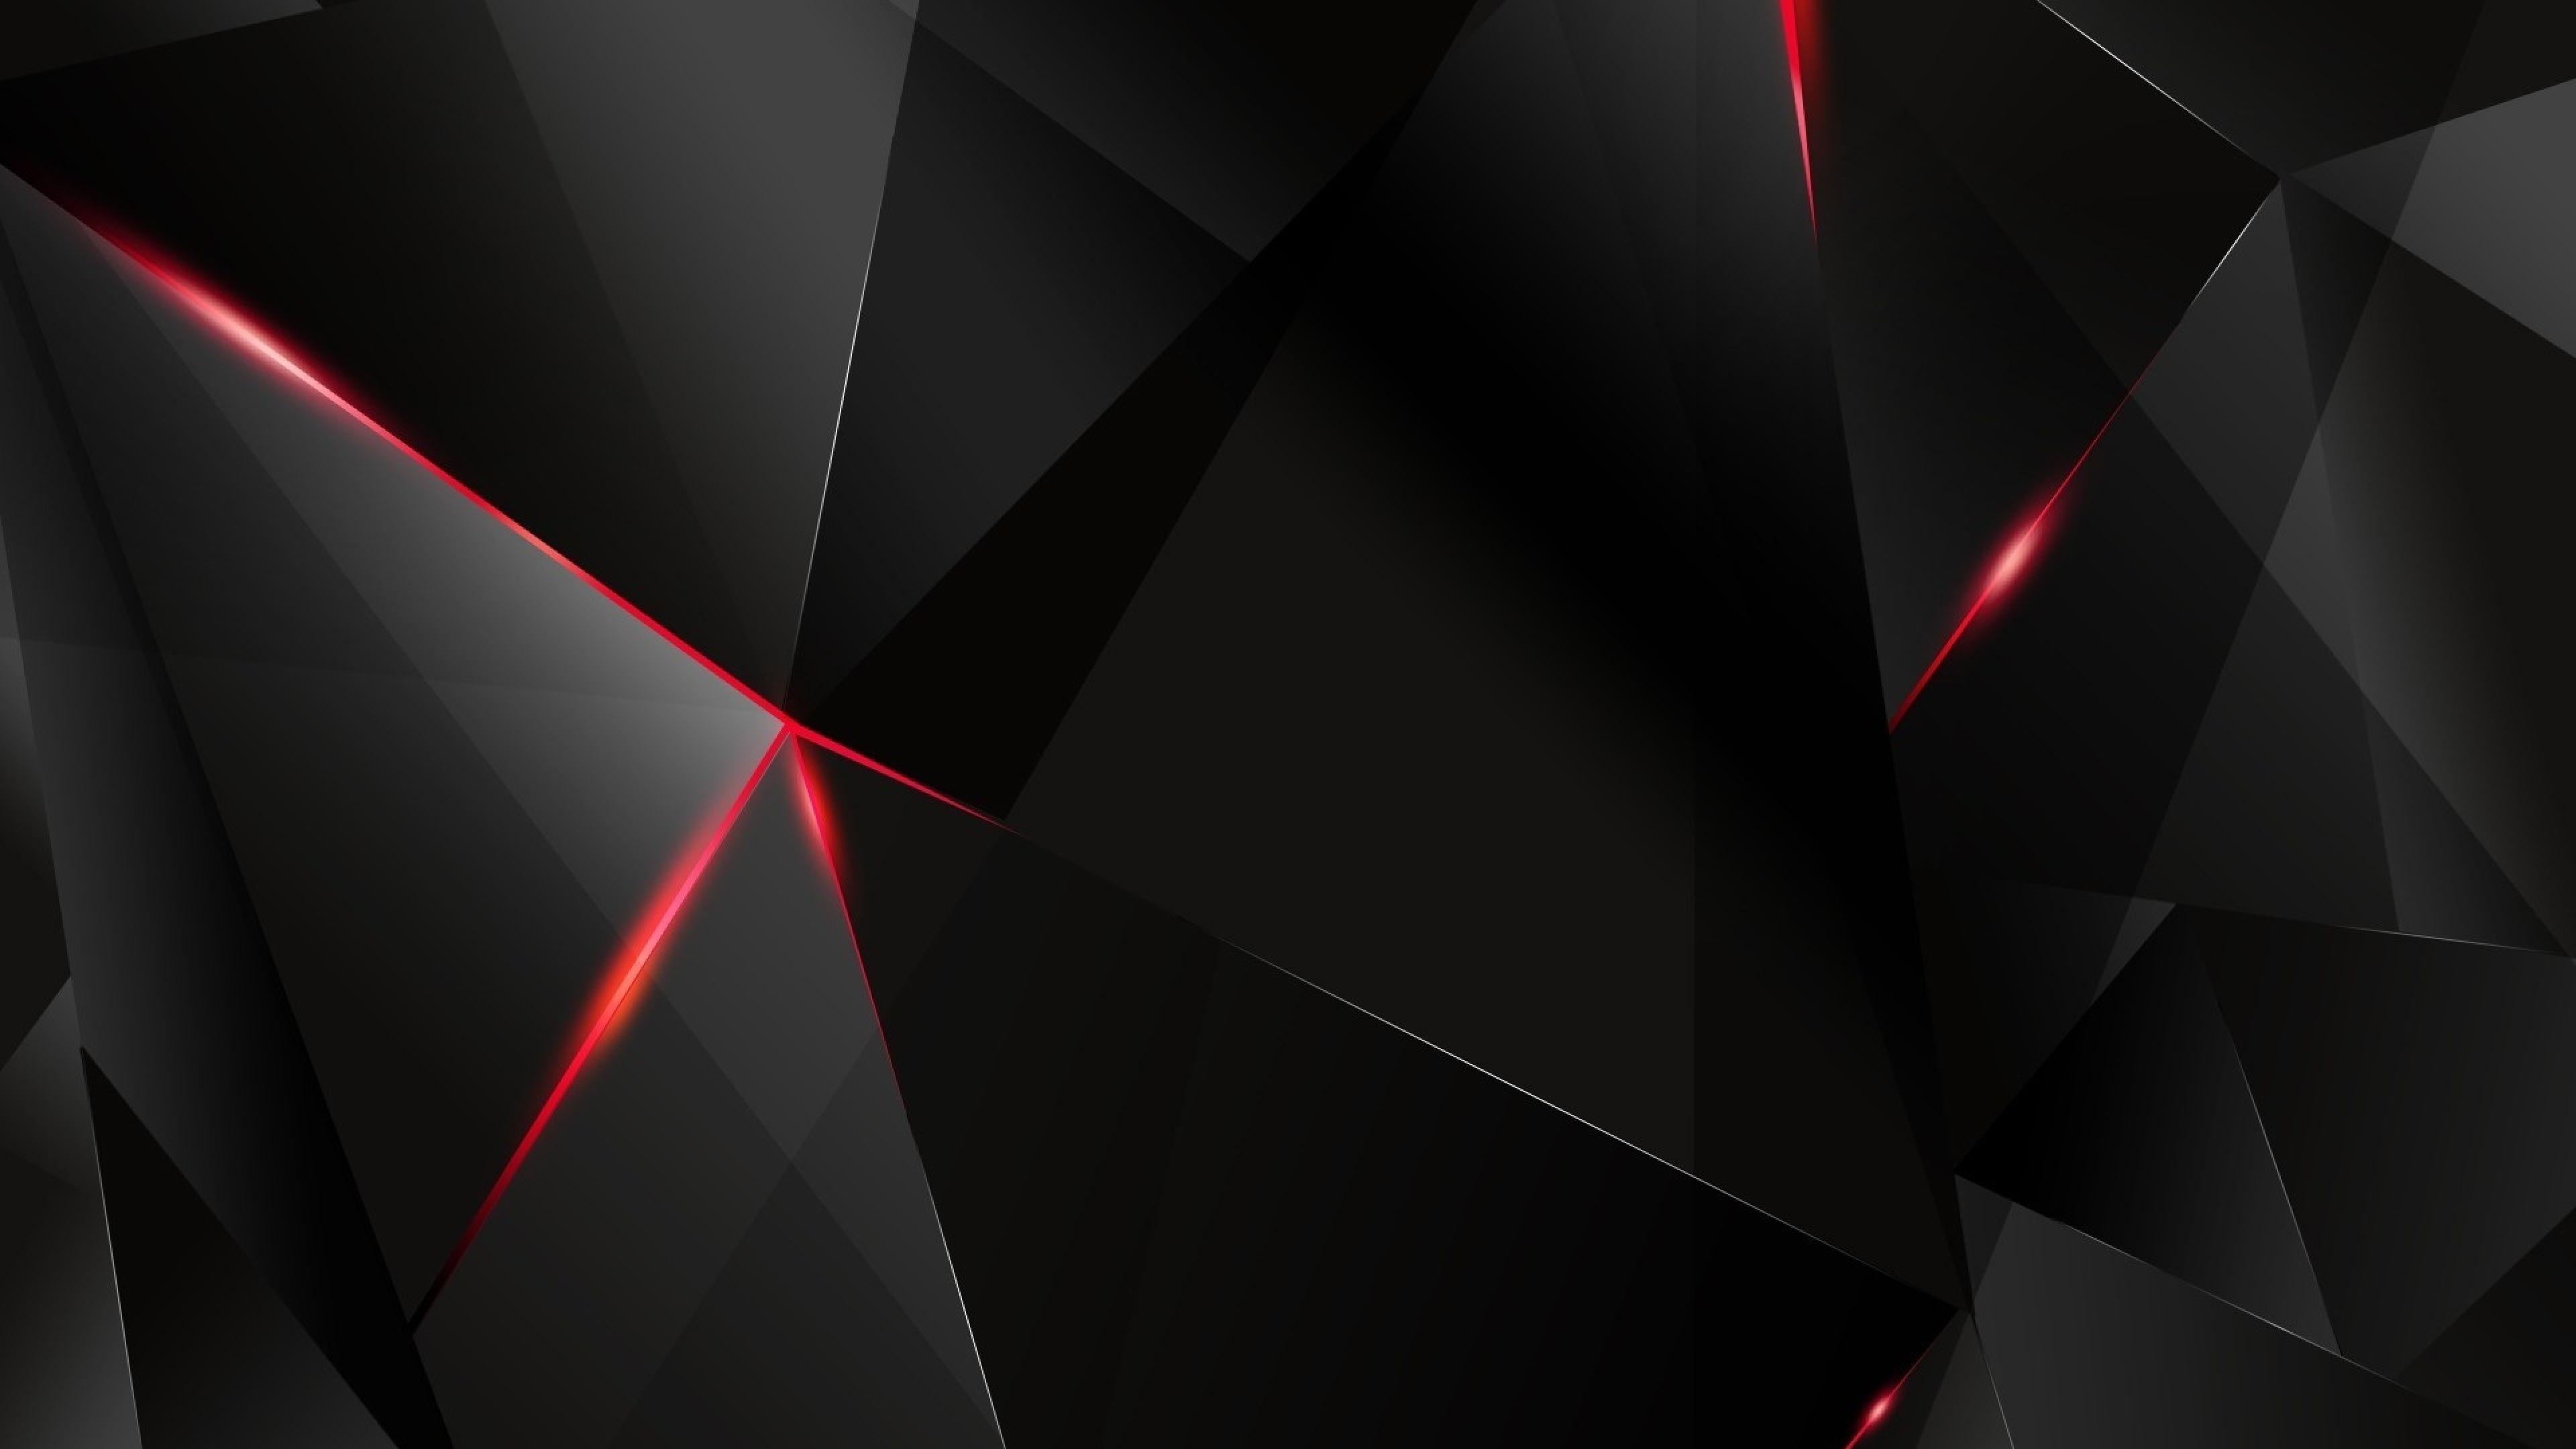 Download Wallpaper 3840x2160 Black Light Dark Figures 4K Ultra 3840x2160